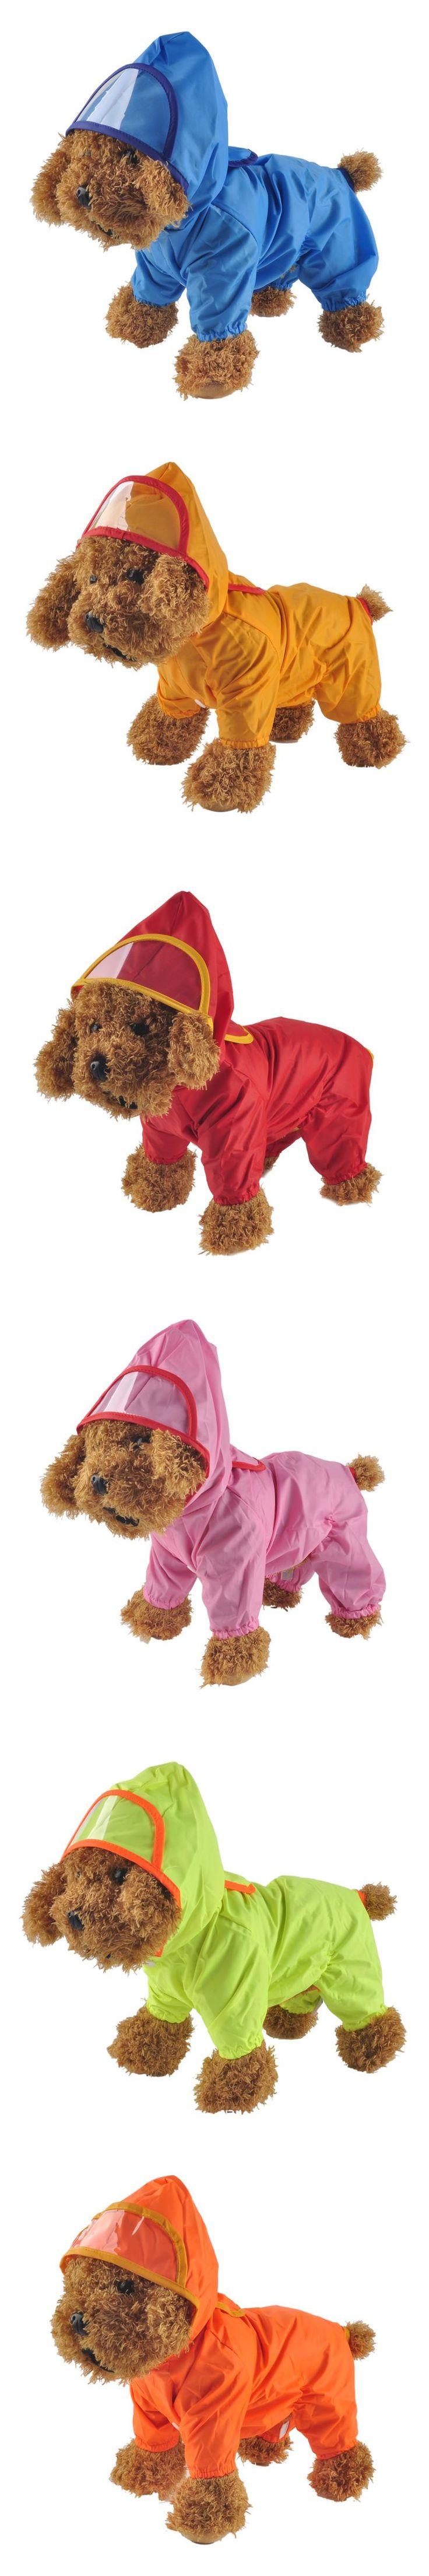 Pet Dog Hoody Jacket Rain Coat New Pets Dogs Solid Raincoat Clothes Slicker Jumpsuit Chubasqueros Para Perros Poncho Ropa Perro